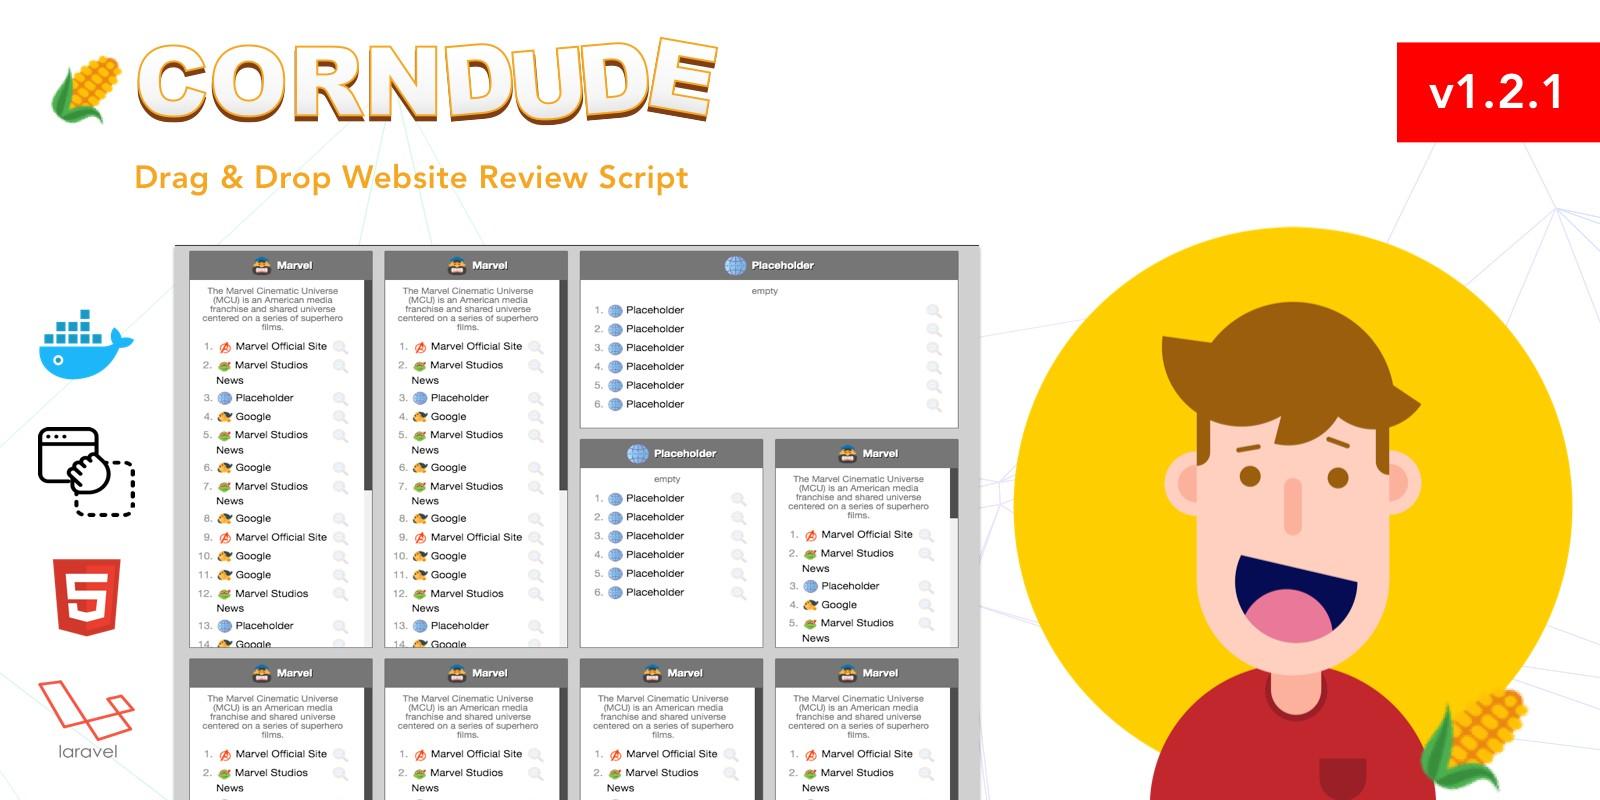 Corndude - Drag And Drop Website Review Script